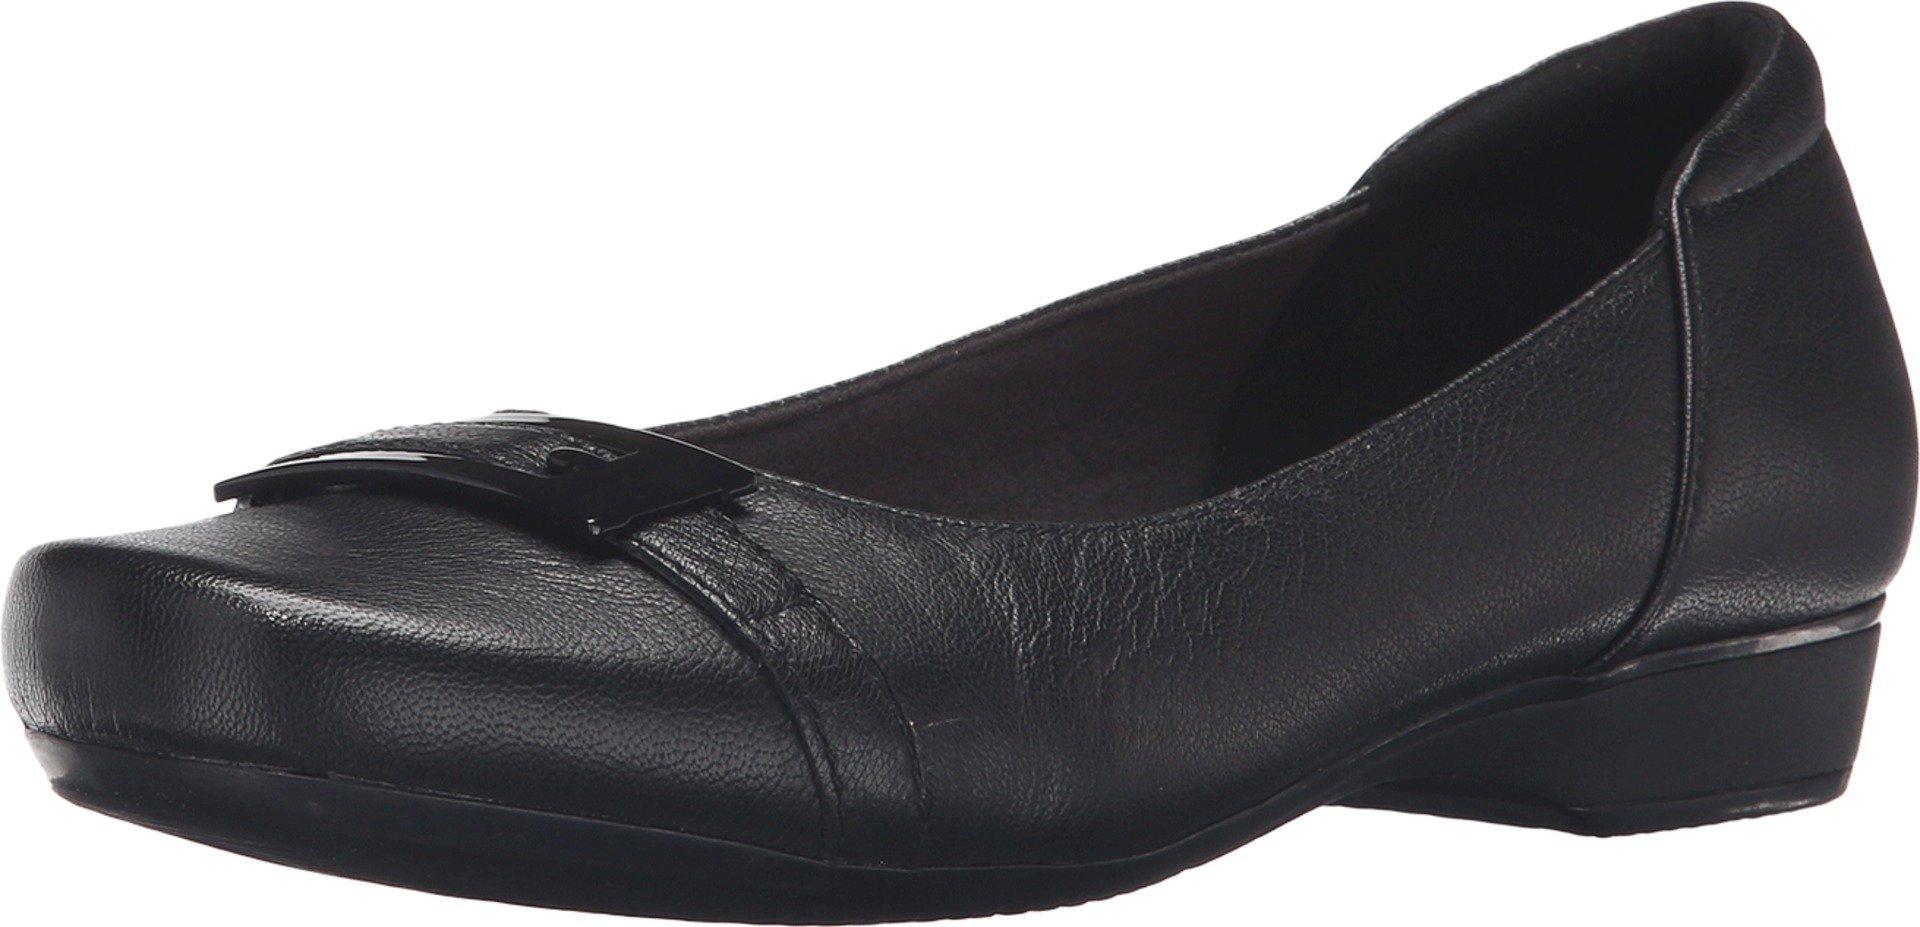 CLARKS Women's Blanche West Flat, Black Leather, 7.5 M US